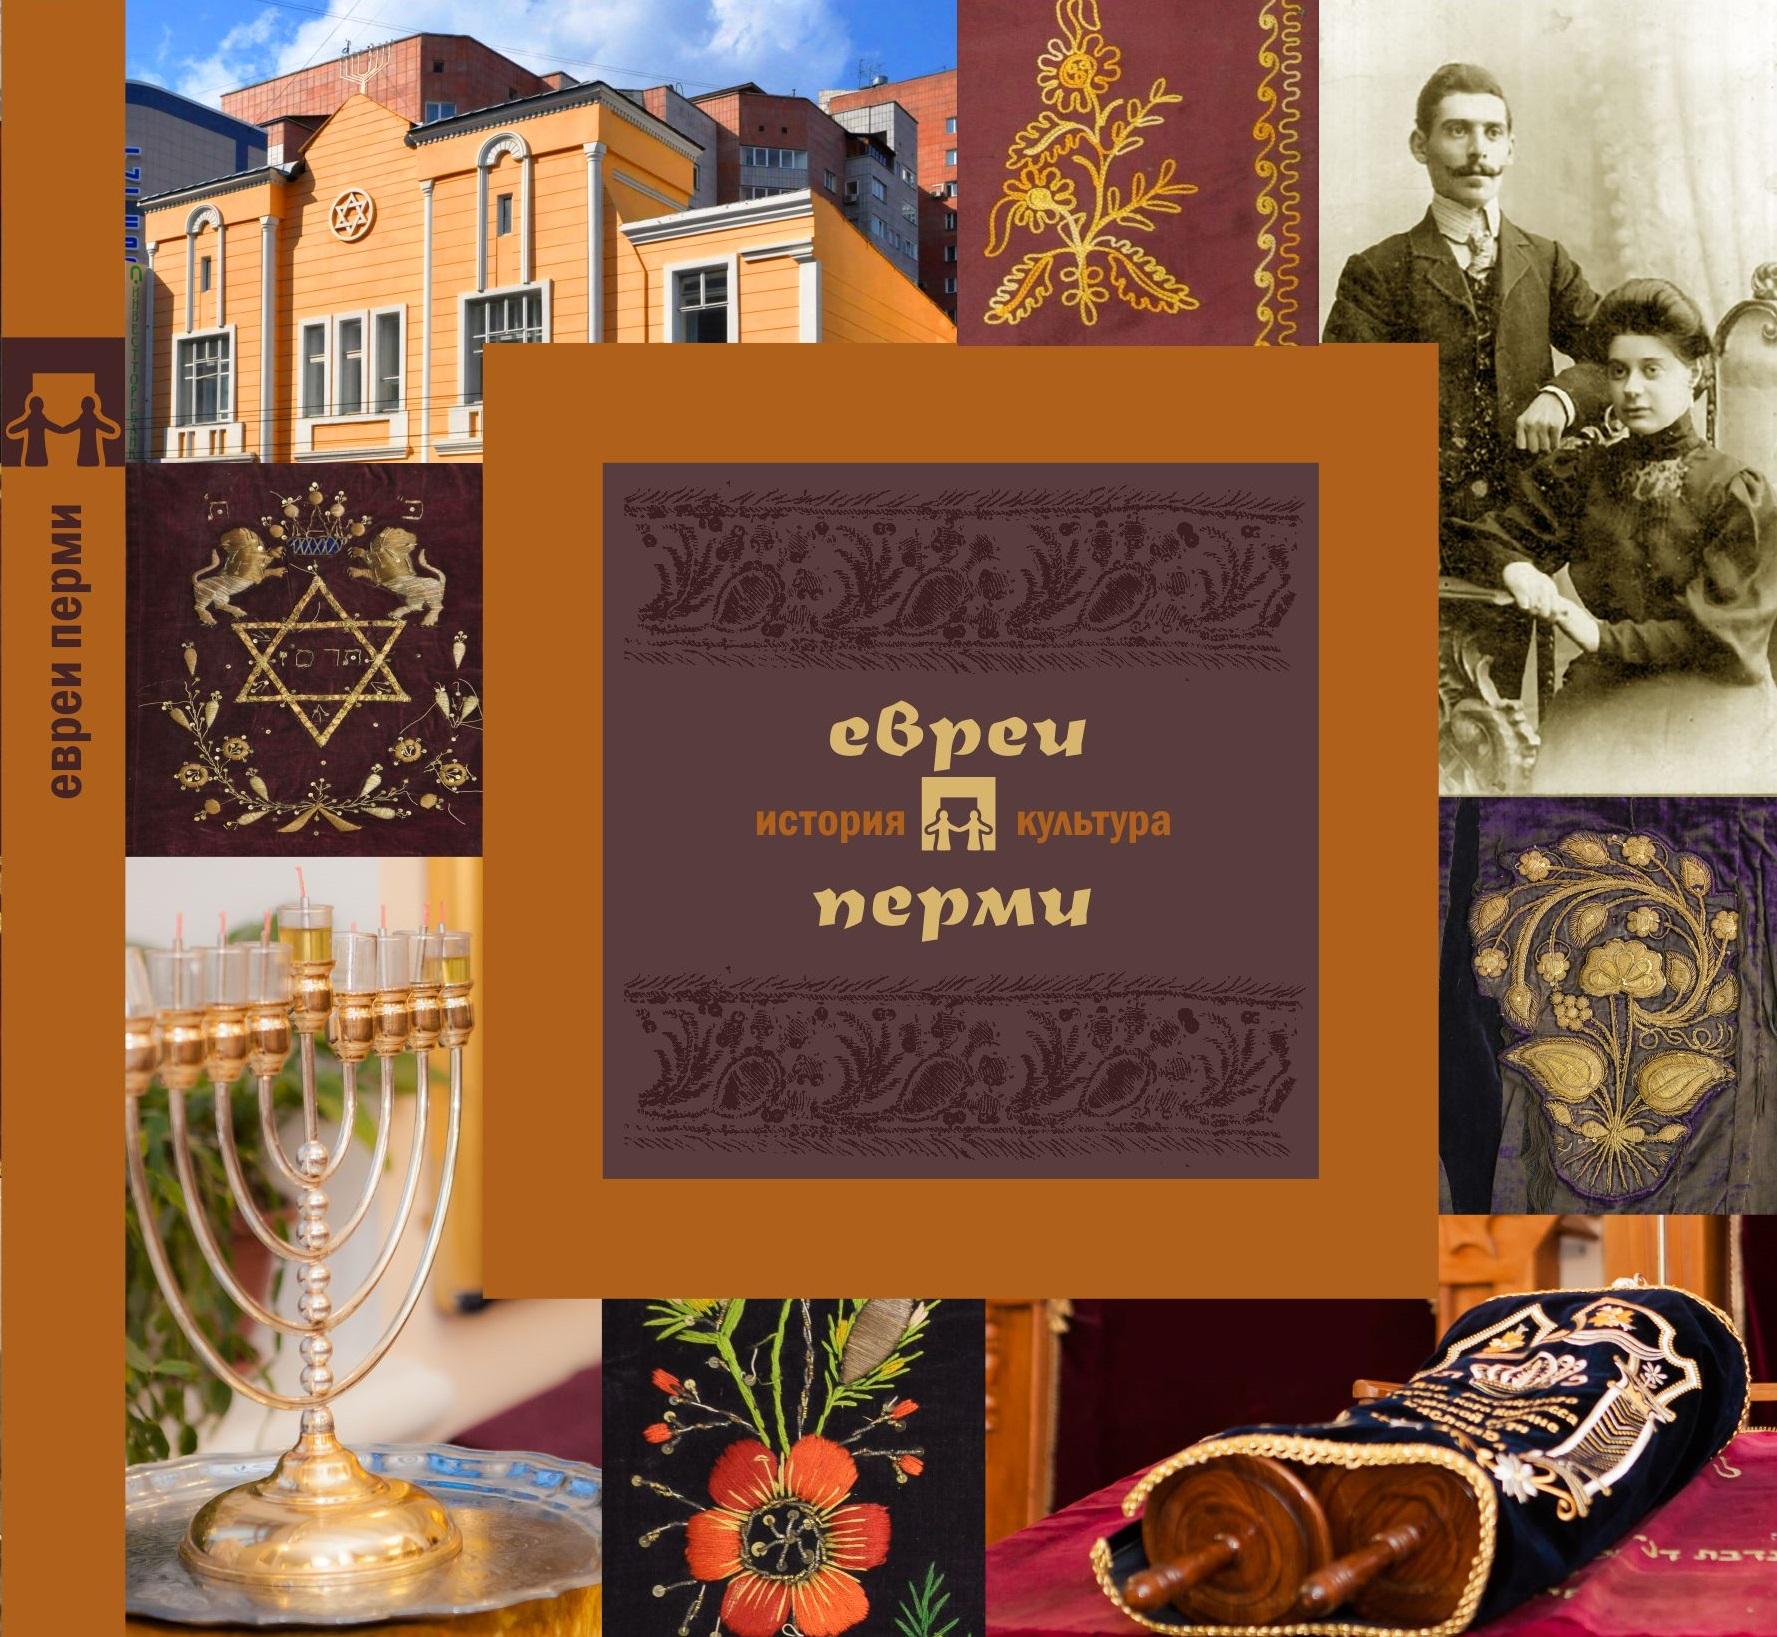 Д. И. айман Ереи : история и культура